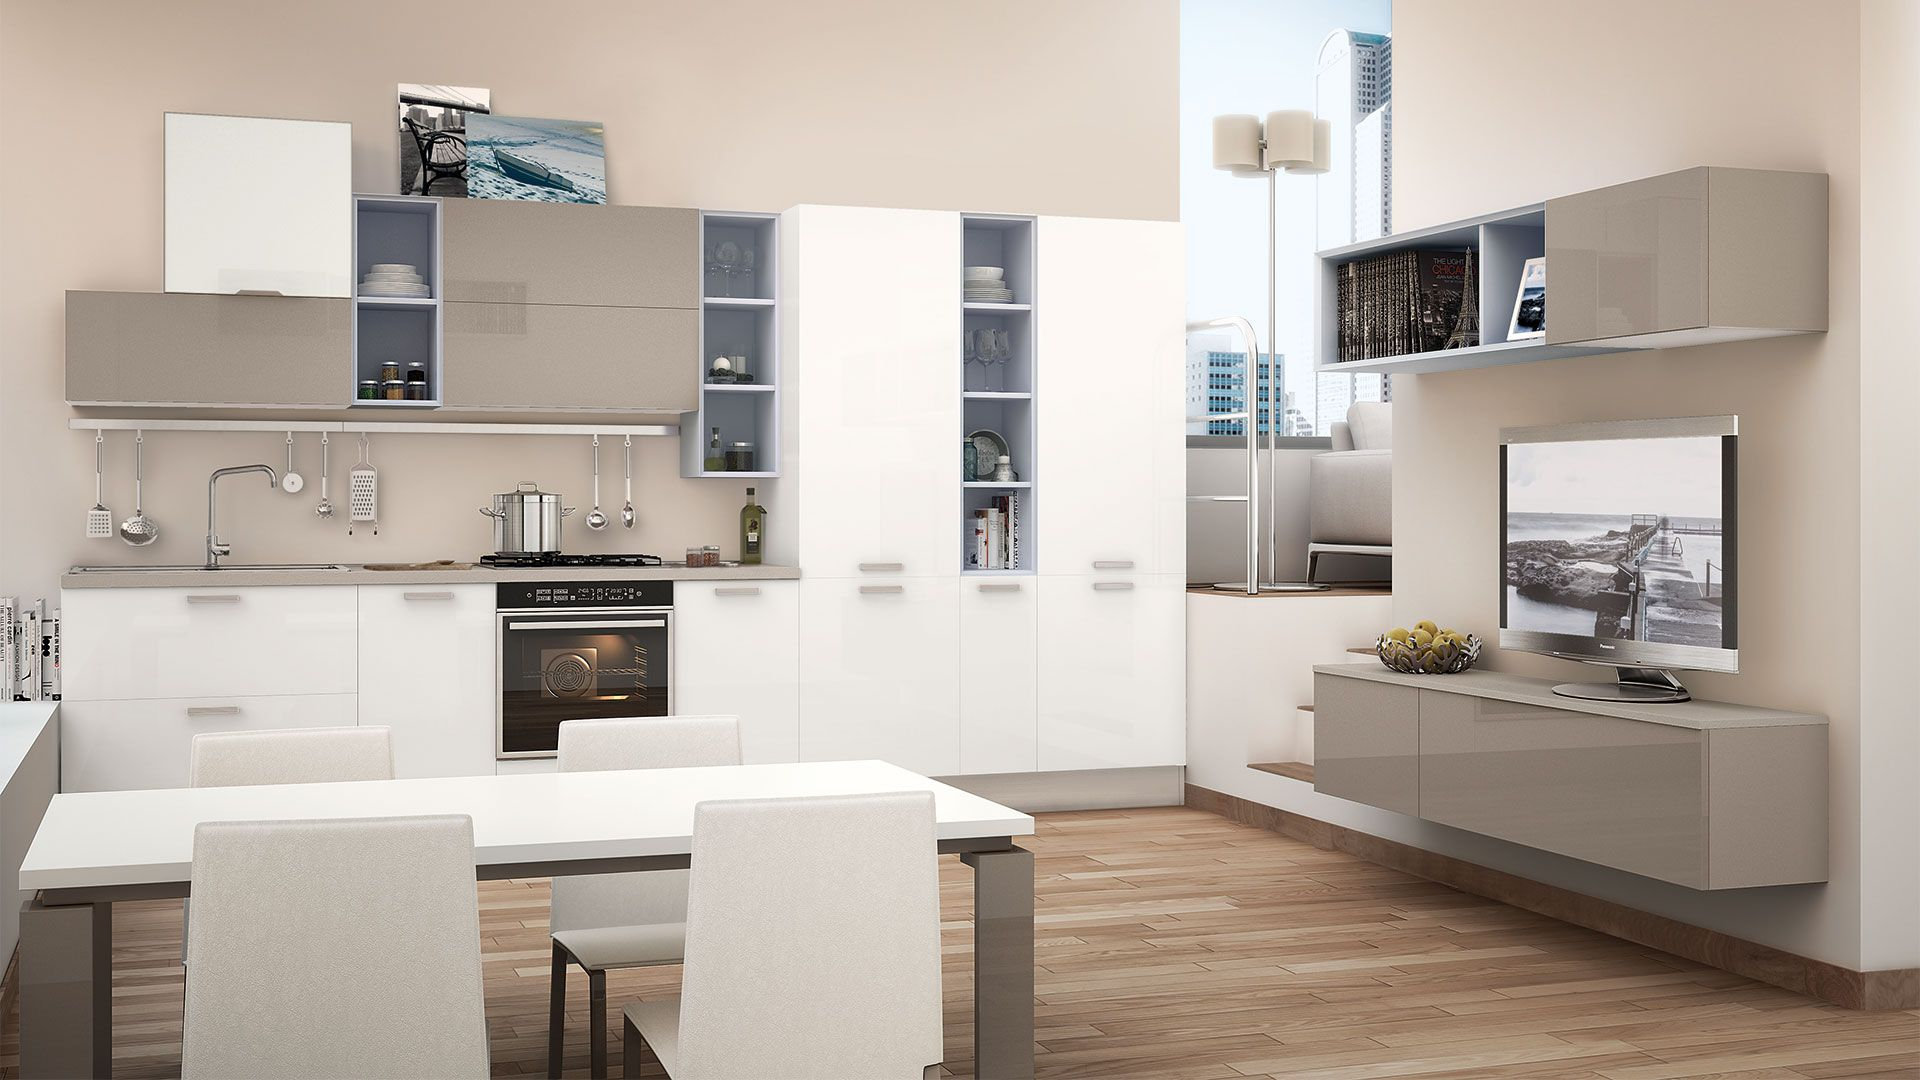 Noemi - Cucine Moderne - Cucine Lube | Expo | Pinterest